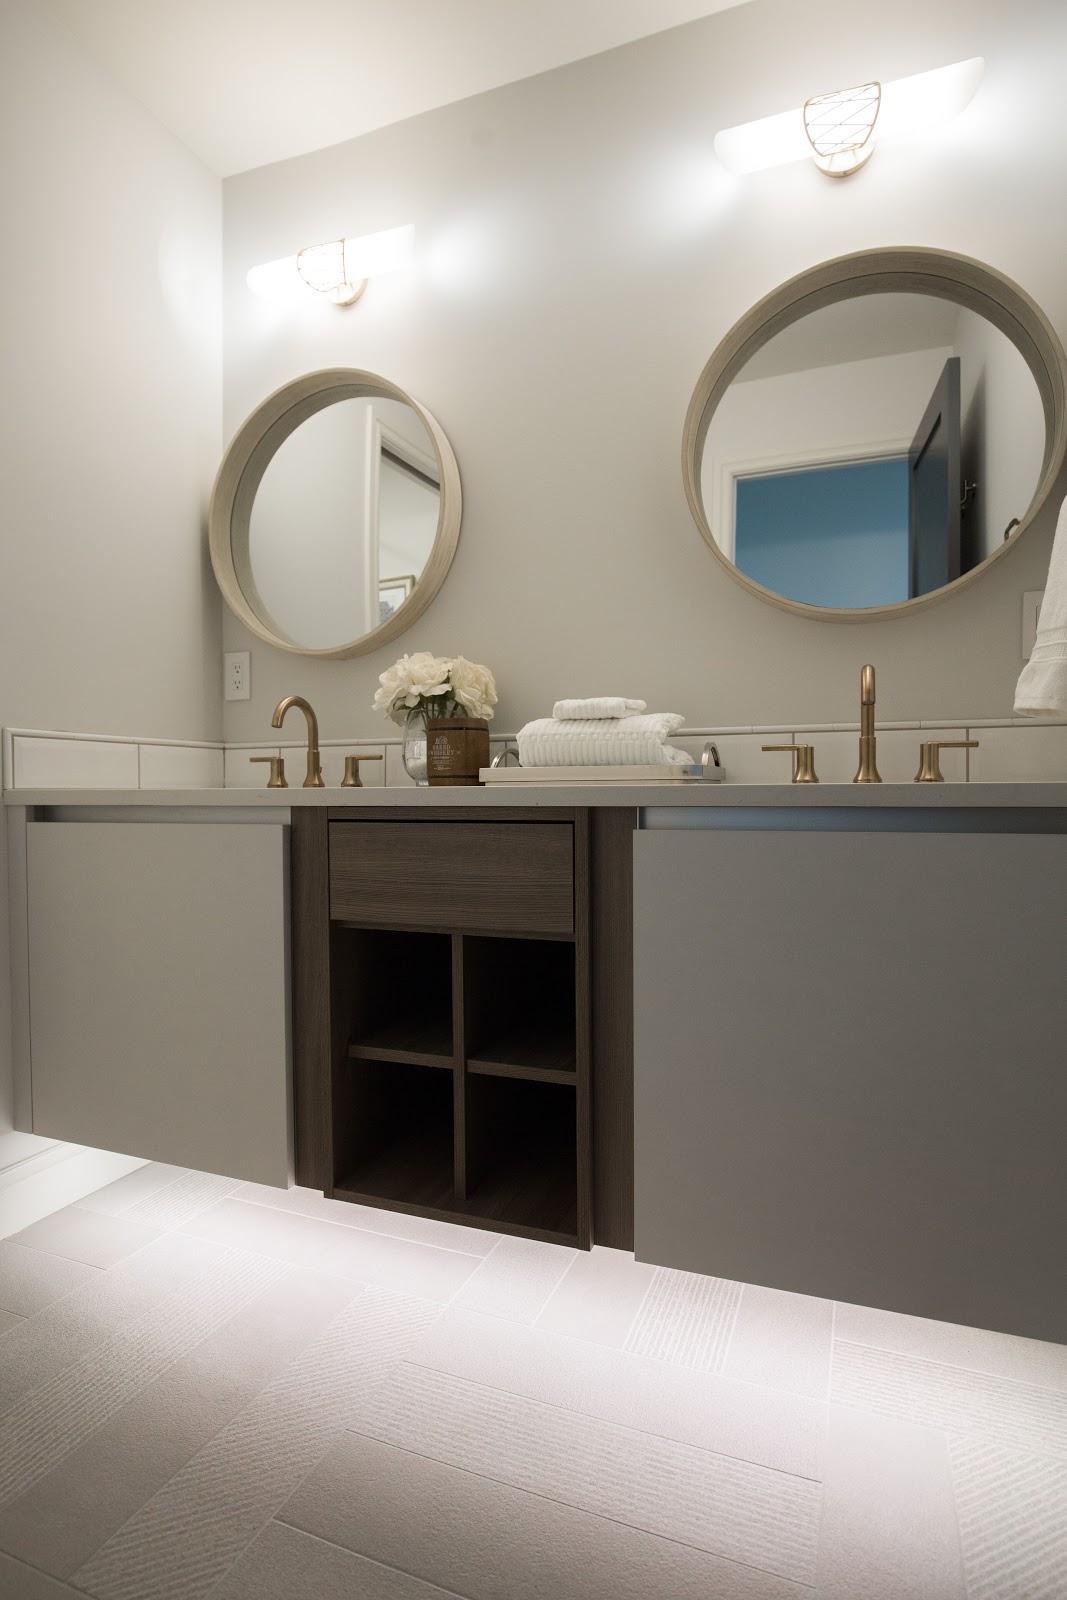 Calgary interior design modern traditional cosy elegant sconces under cabinet lighting